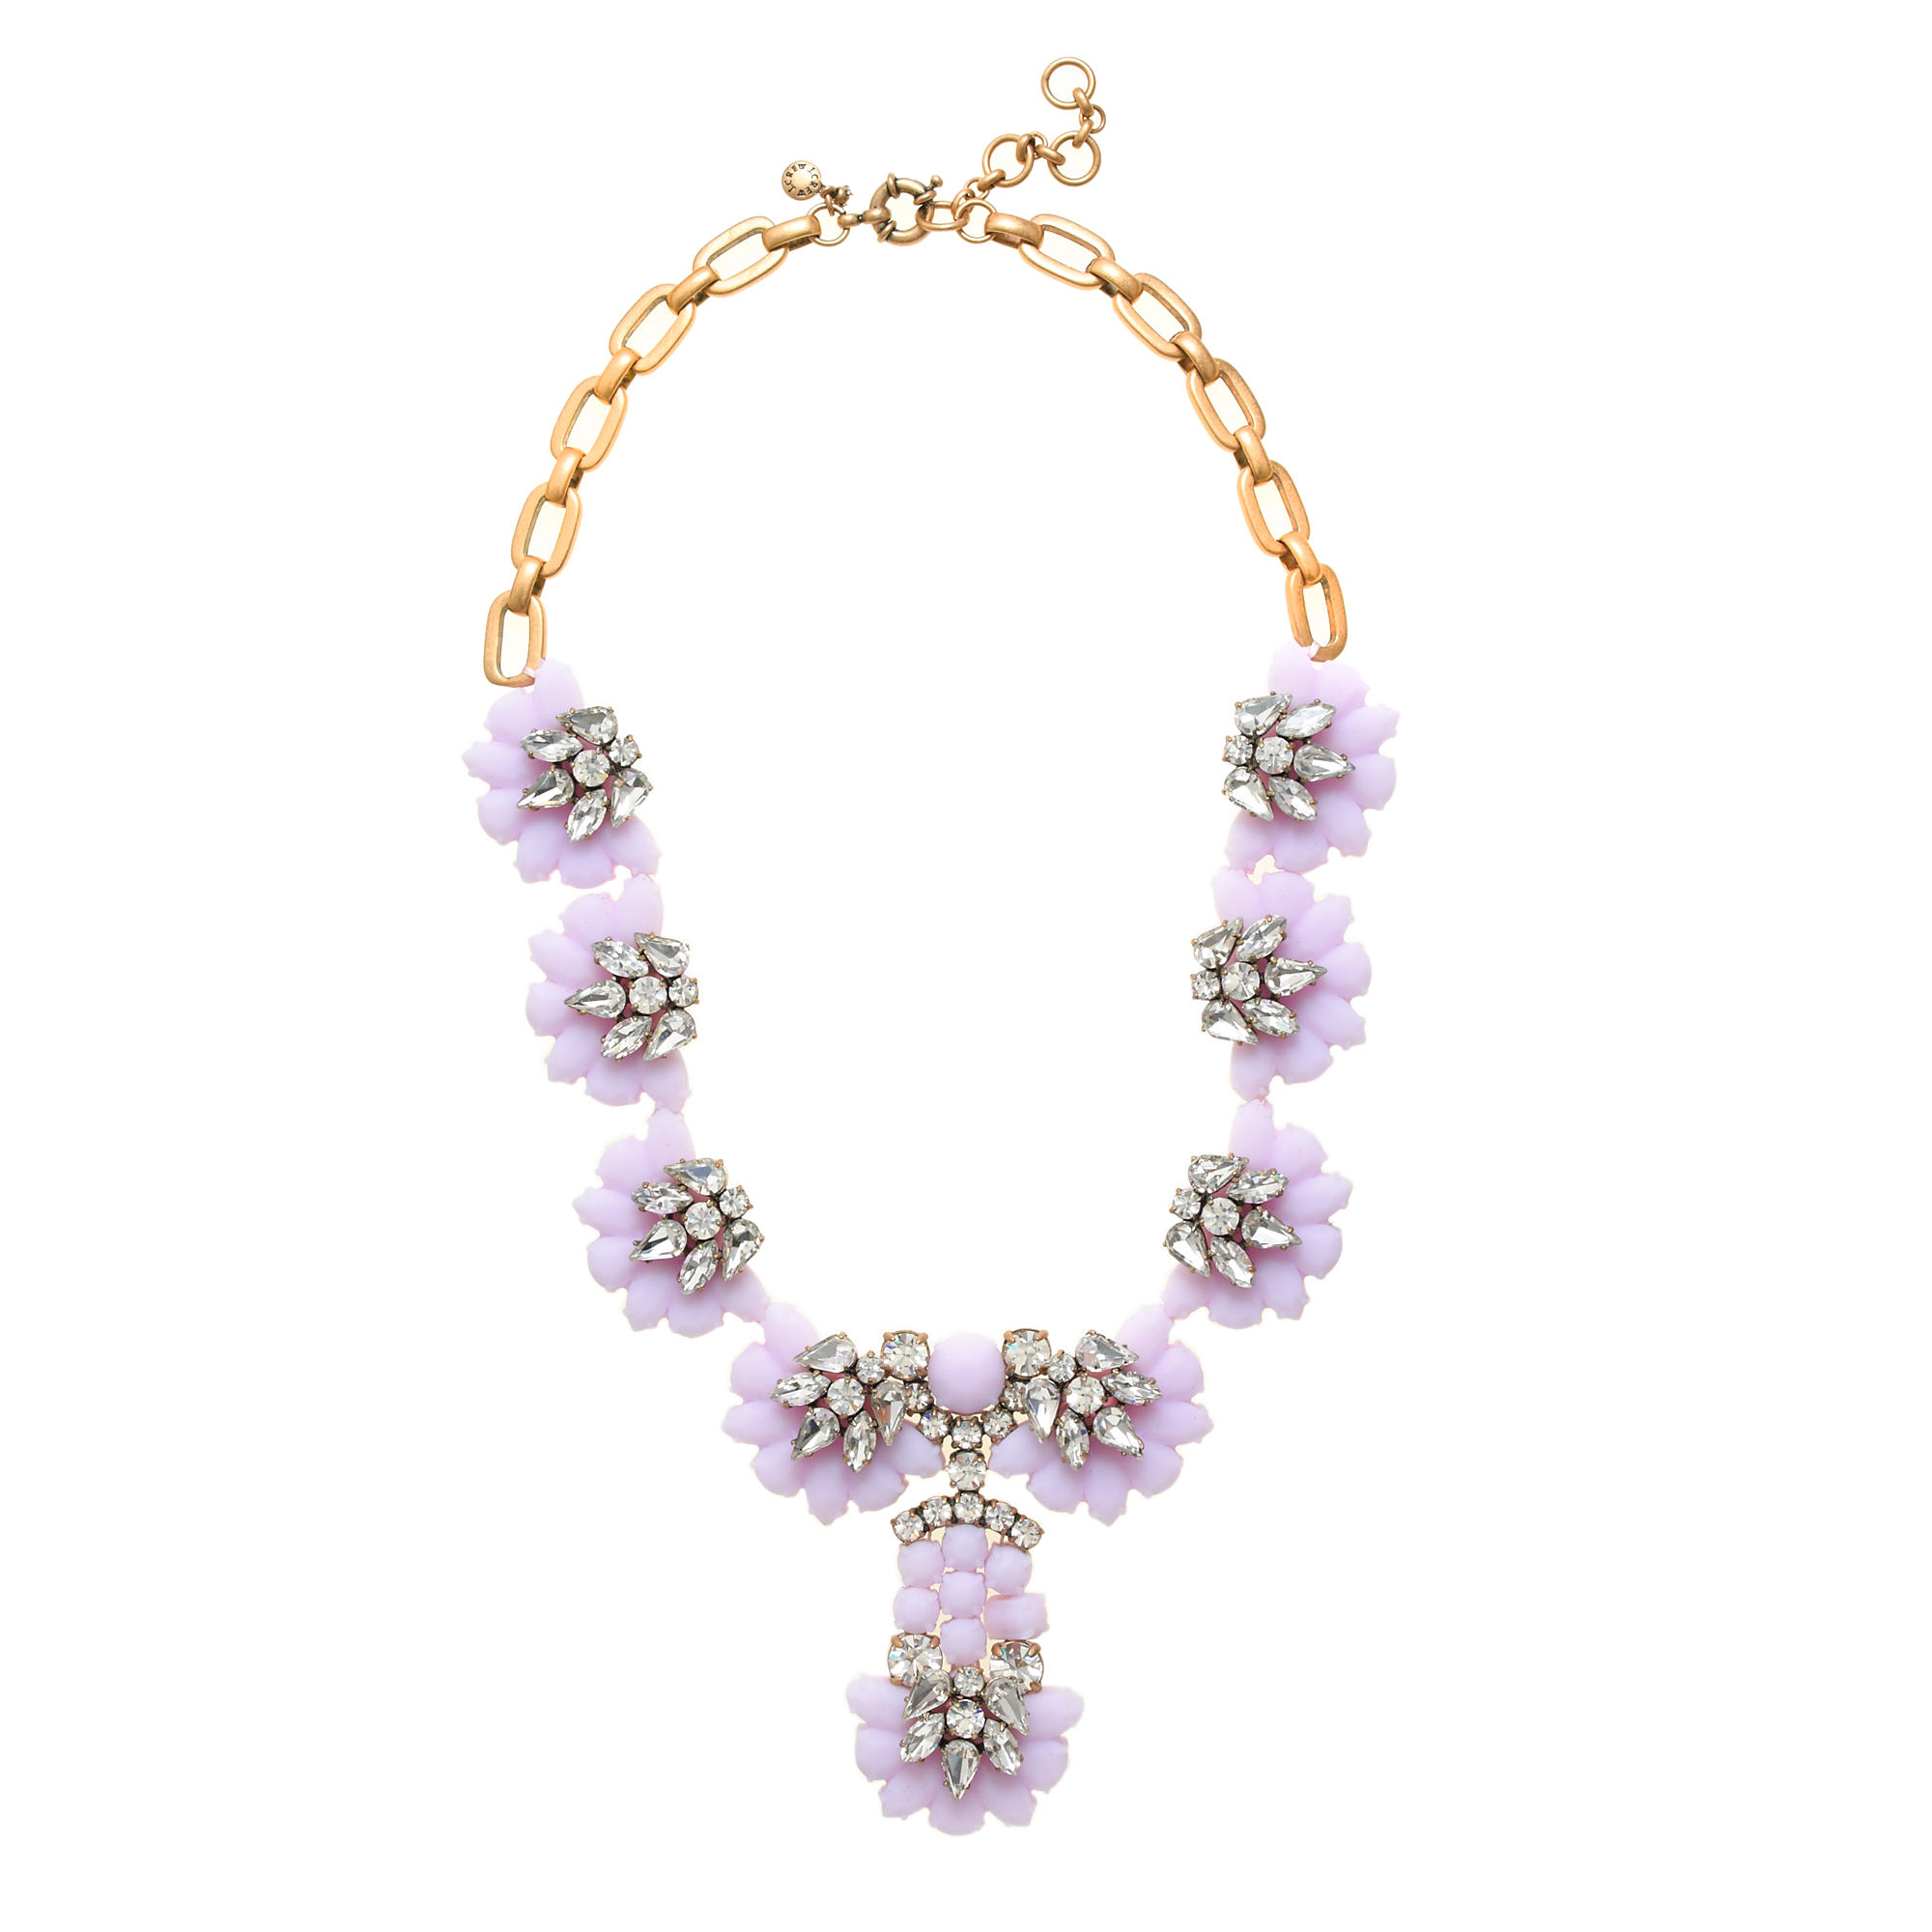 Crystal color flower necklace